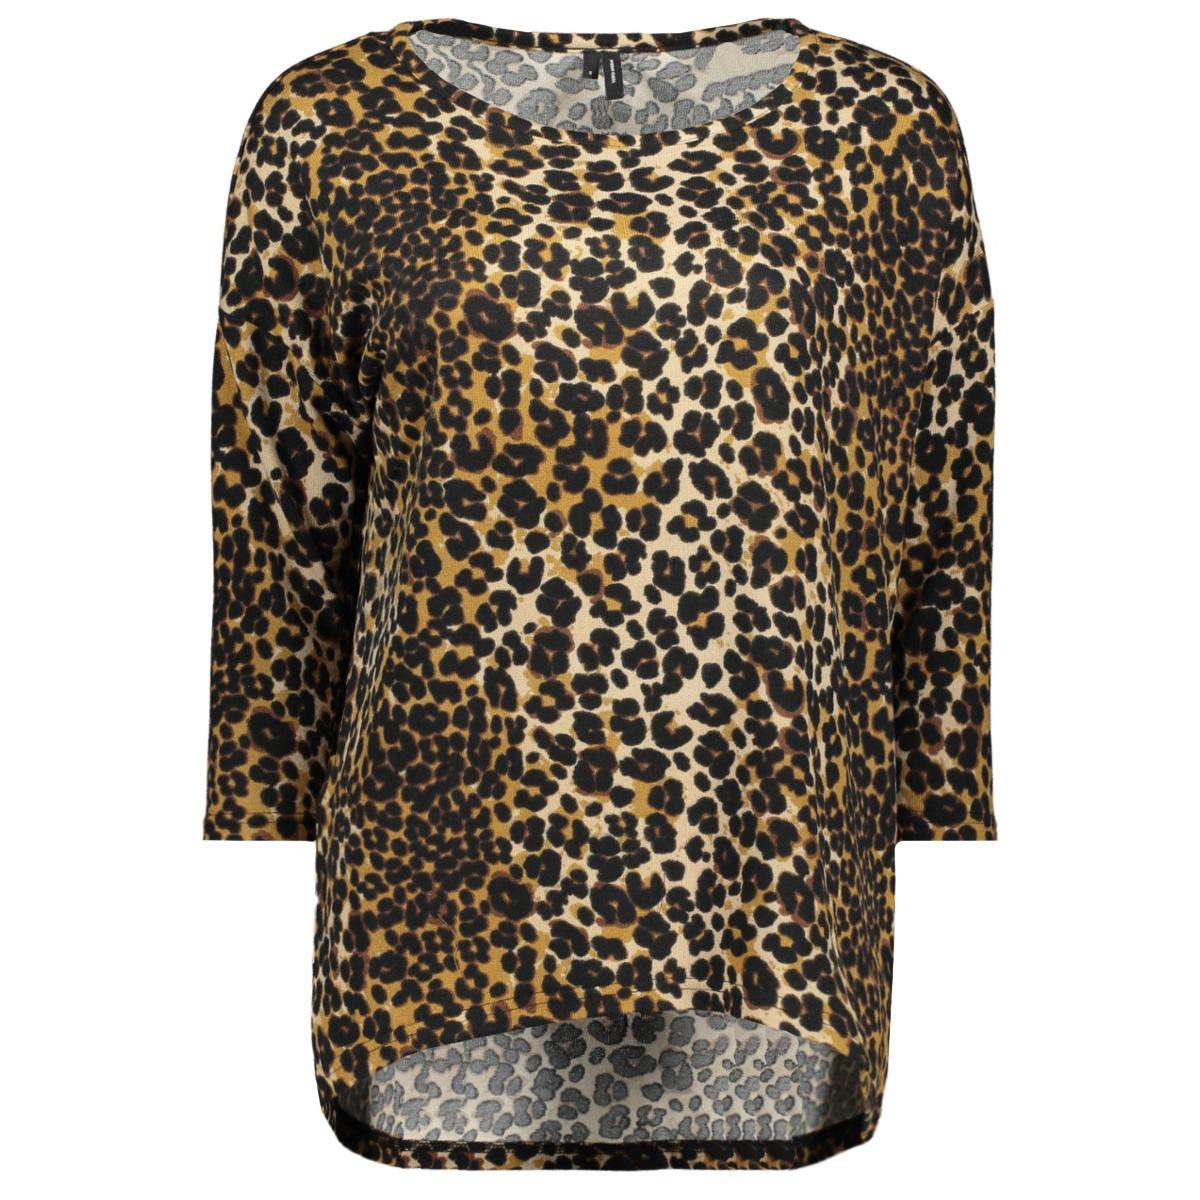 vmmalena 3/4 blouse exp noos 10201689 vero moda trui silver mink/ lia